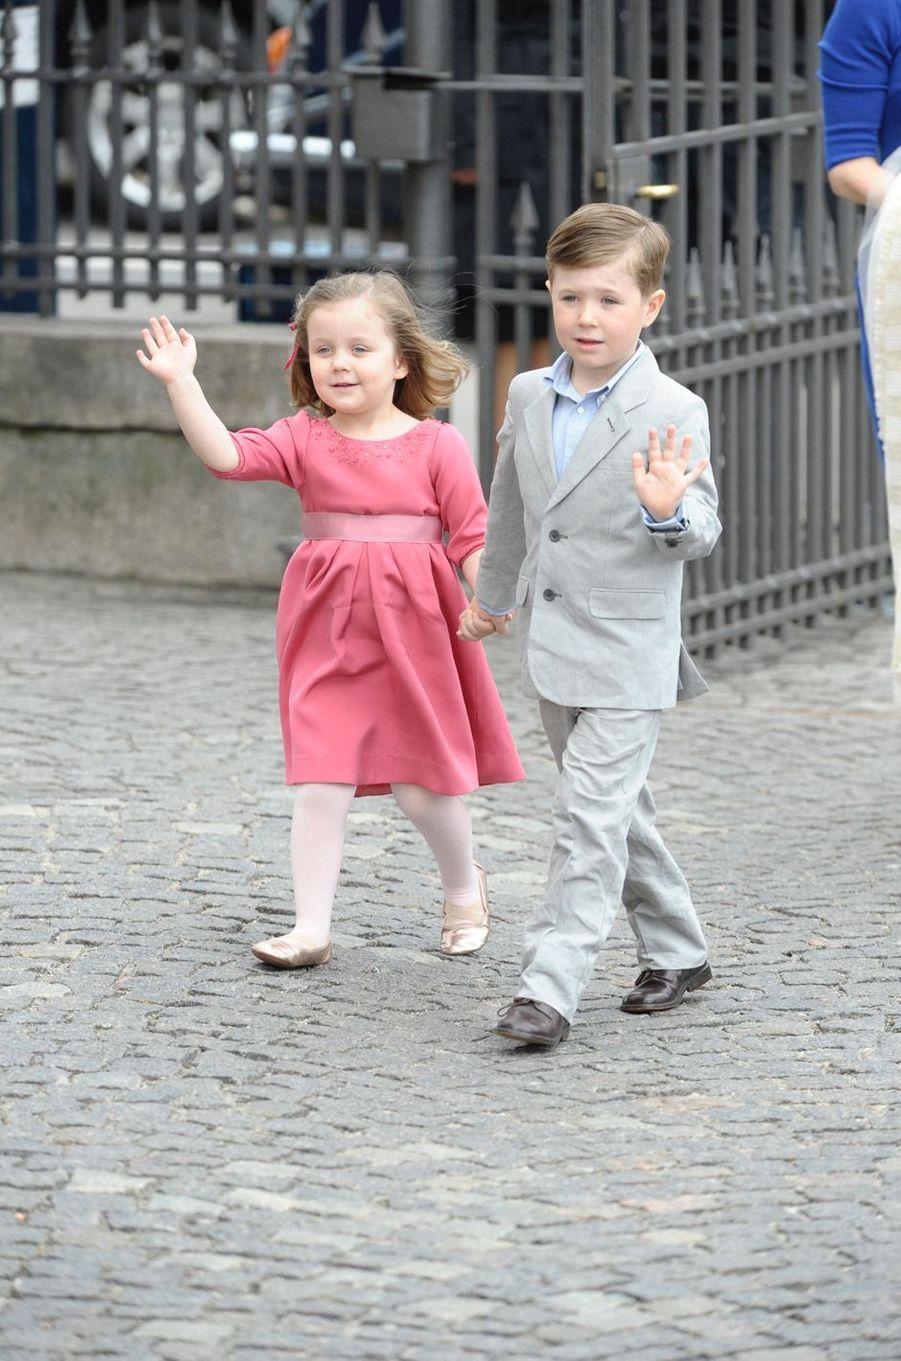 Le prince Christian de Danemark avec sa soeur la princesse Isabella, le 14 avril 2011